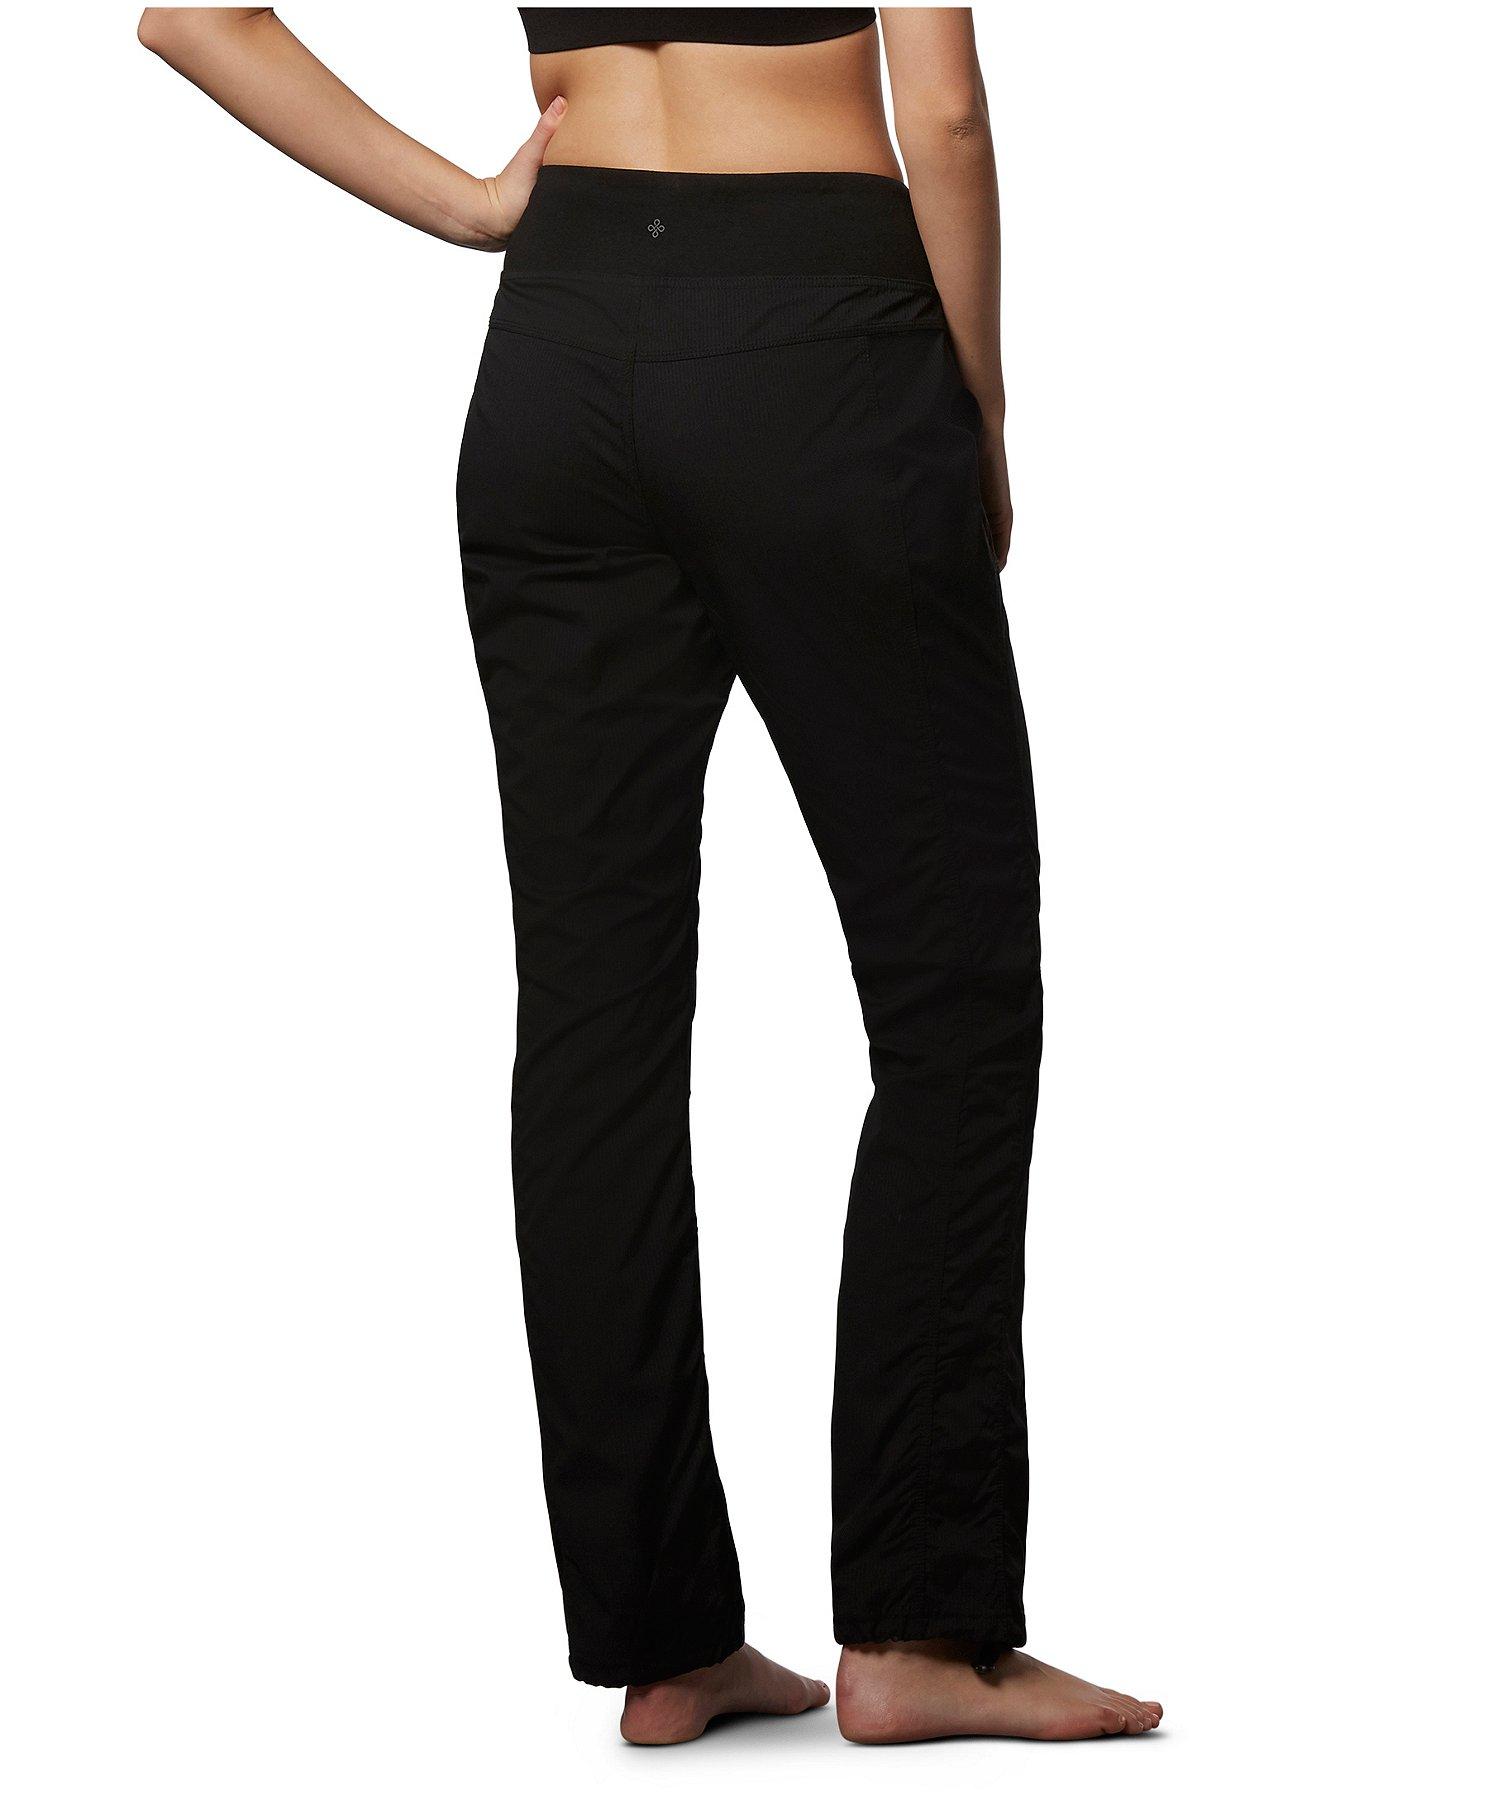 Women's Active Woven Pants | Mark's